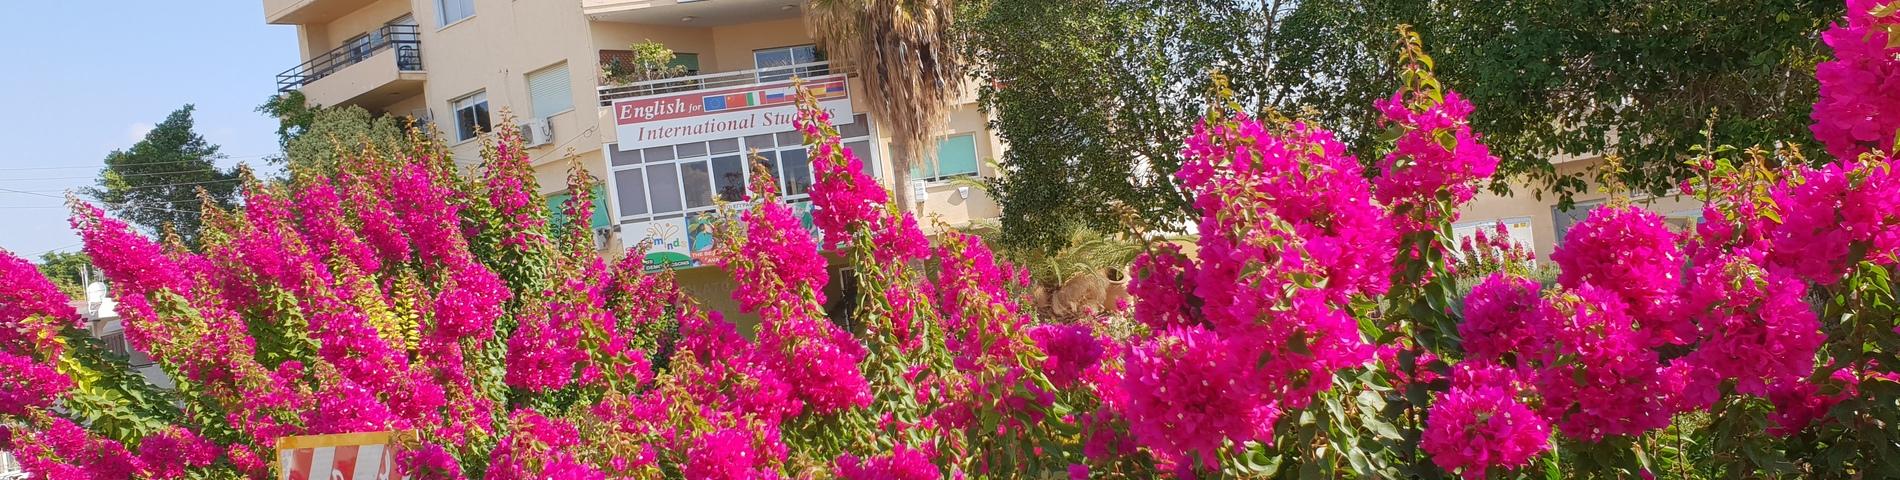 PLATO Educational Services foto 1